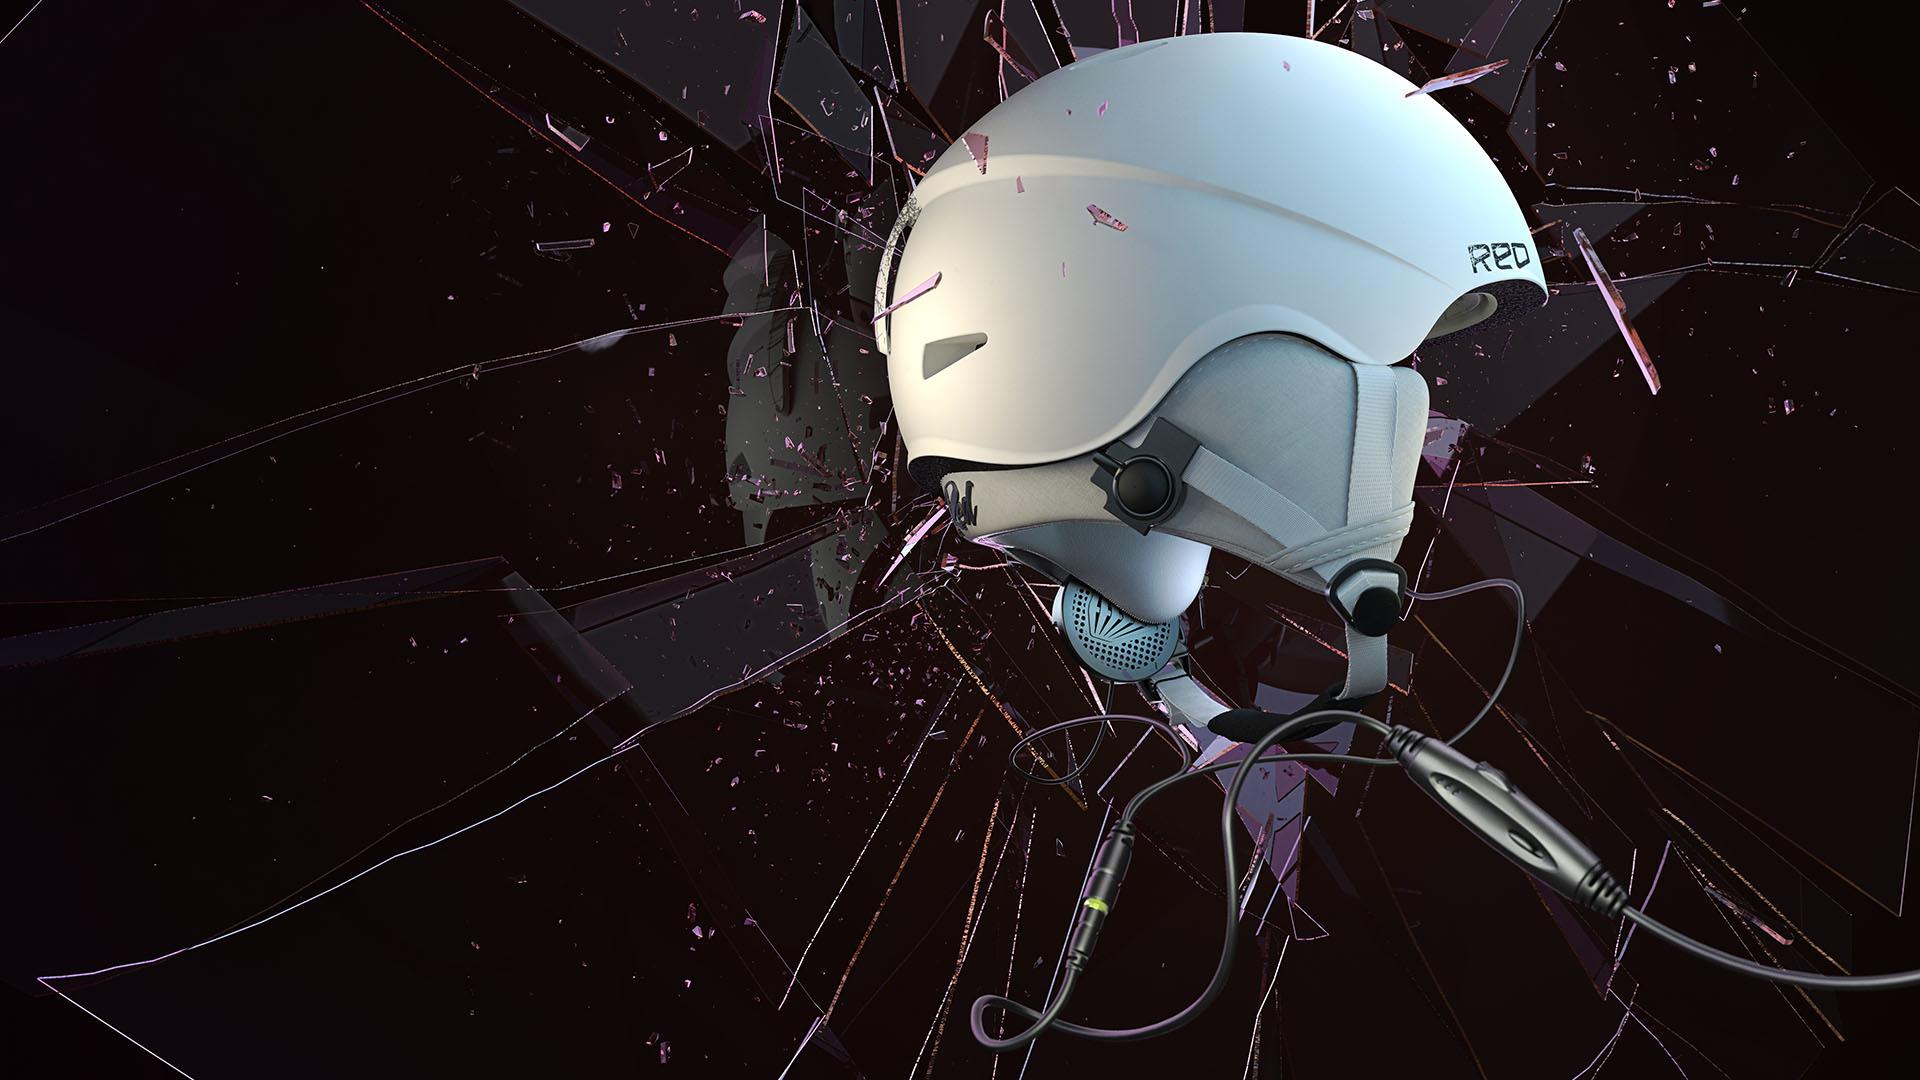 Magoo - 3d design, 3d image, RED, Helmets, Burton